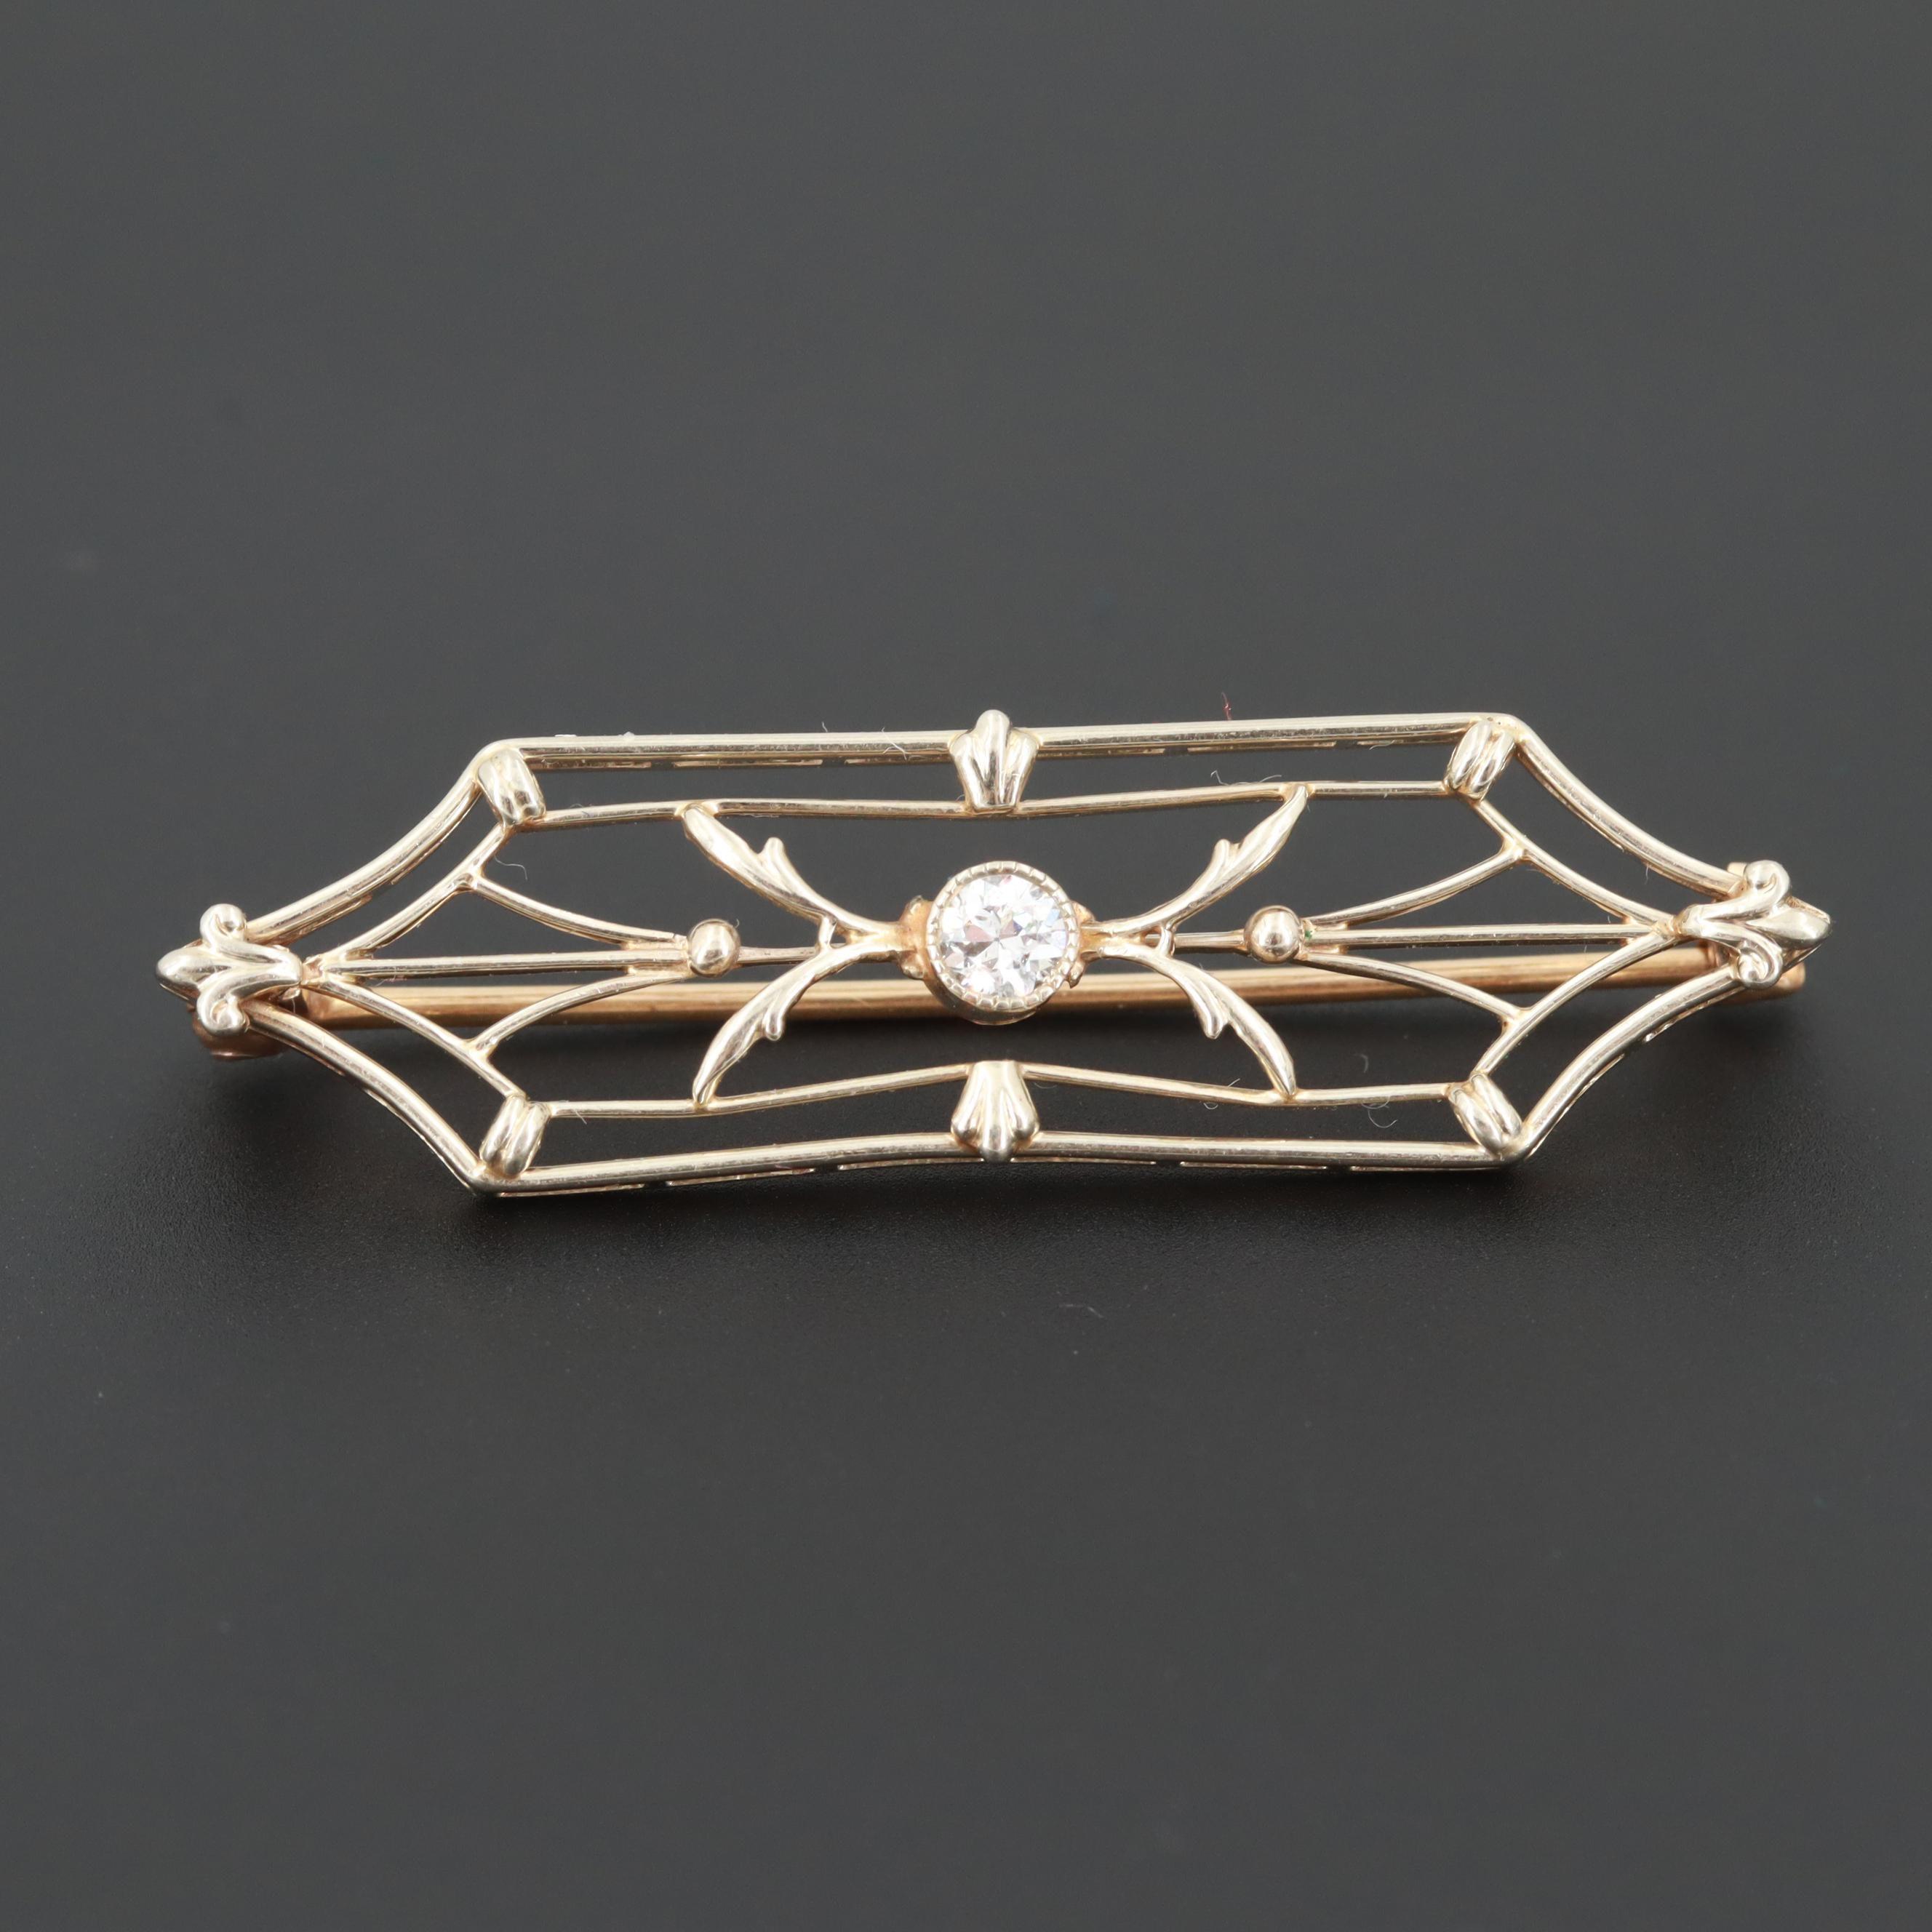 Circa 1920s 14K Yellow Gold Diamond Brooch